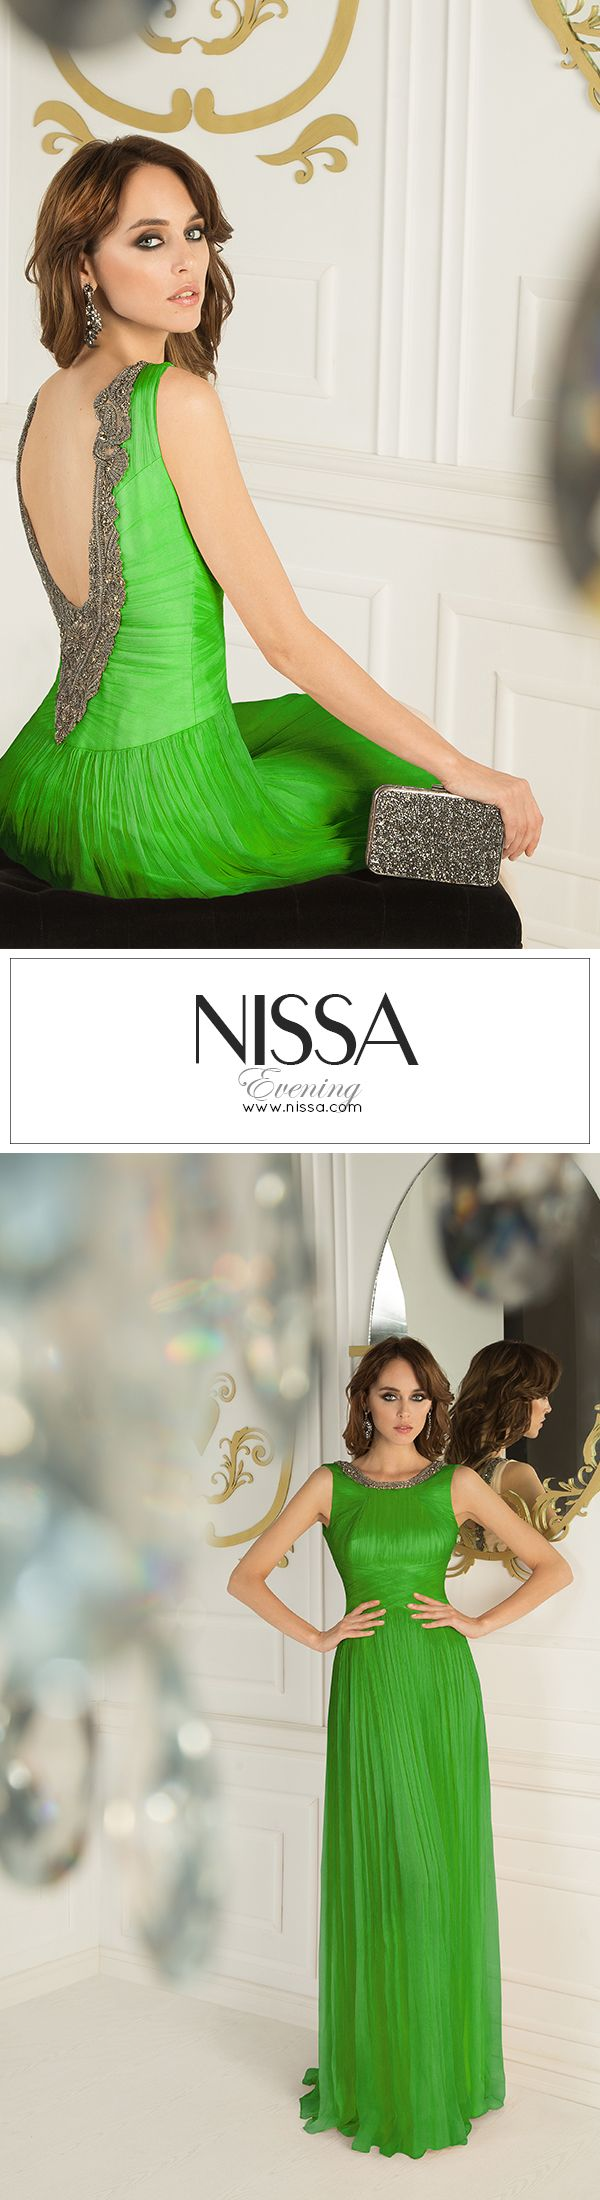 100%Silk Backless Maxi Dress www.nissa.com  #nissa #dress #maxi # #evening #ss2015 #fashion #style #look #gorgeous #long #backless #green